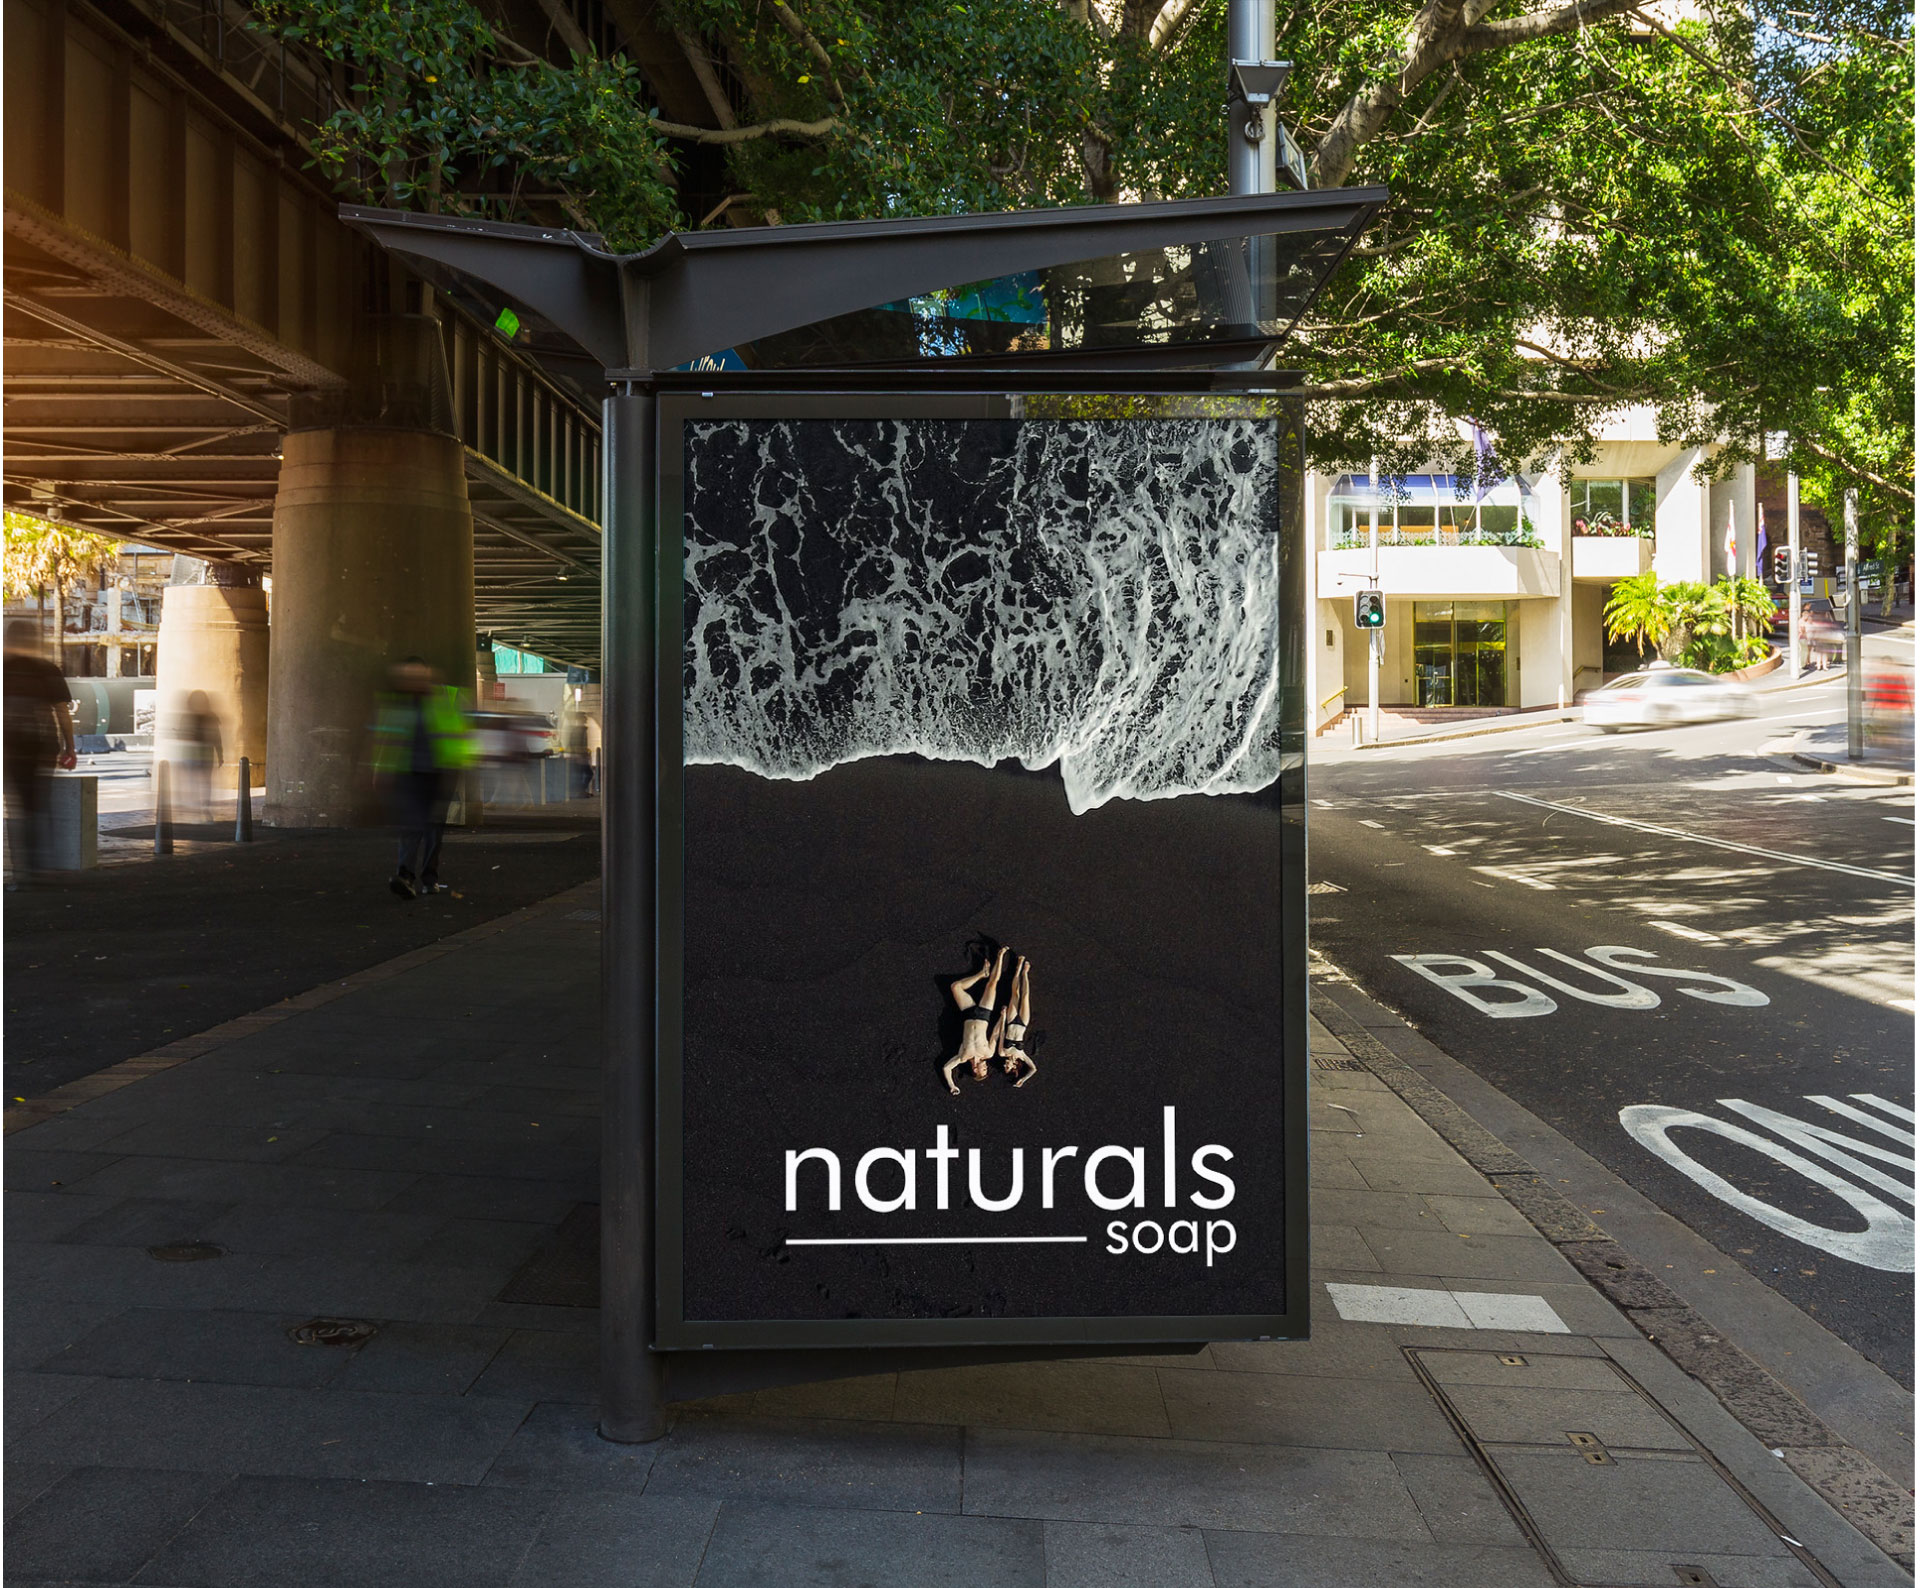 Naturals Soap Hoarding